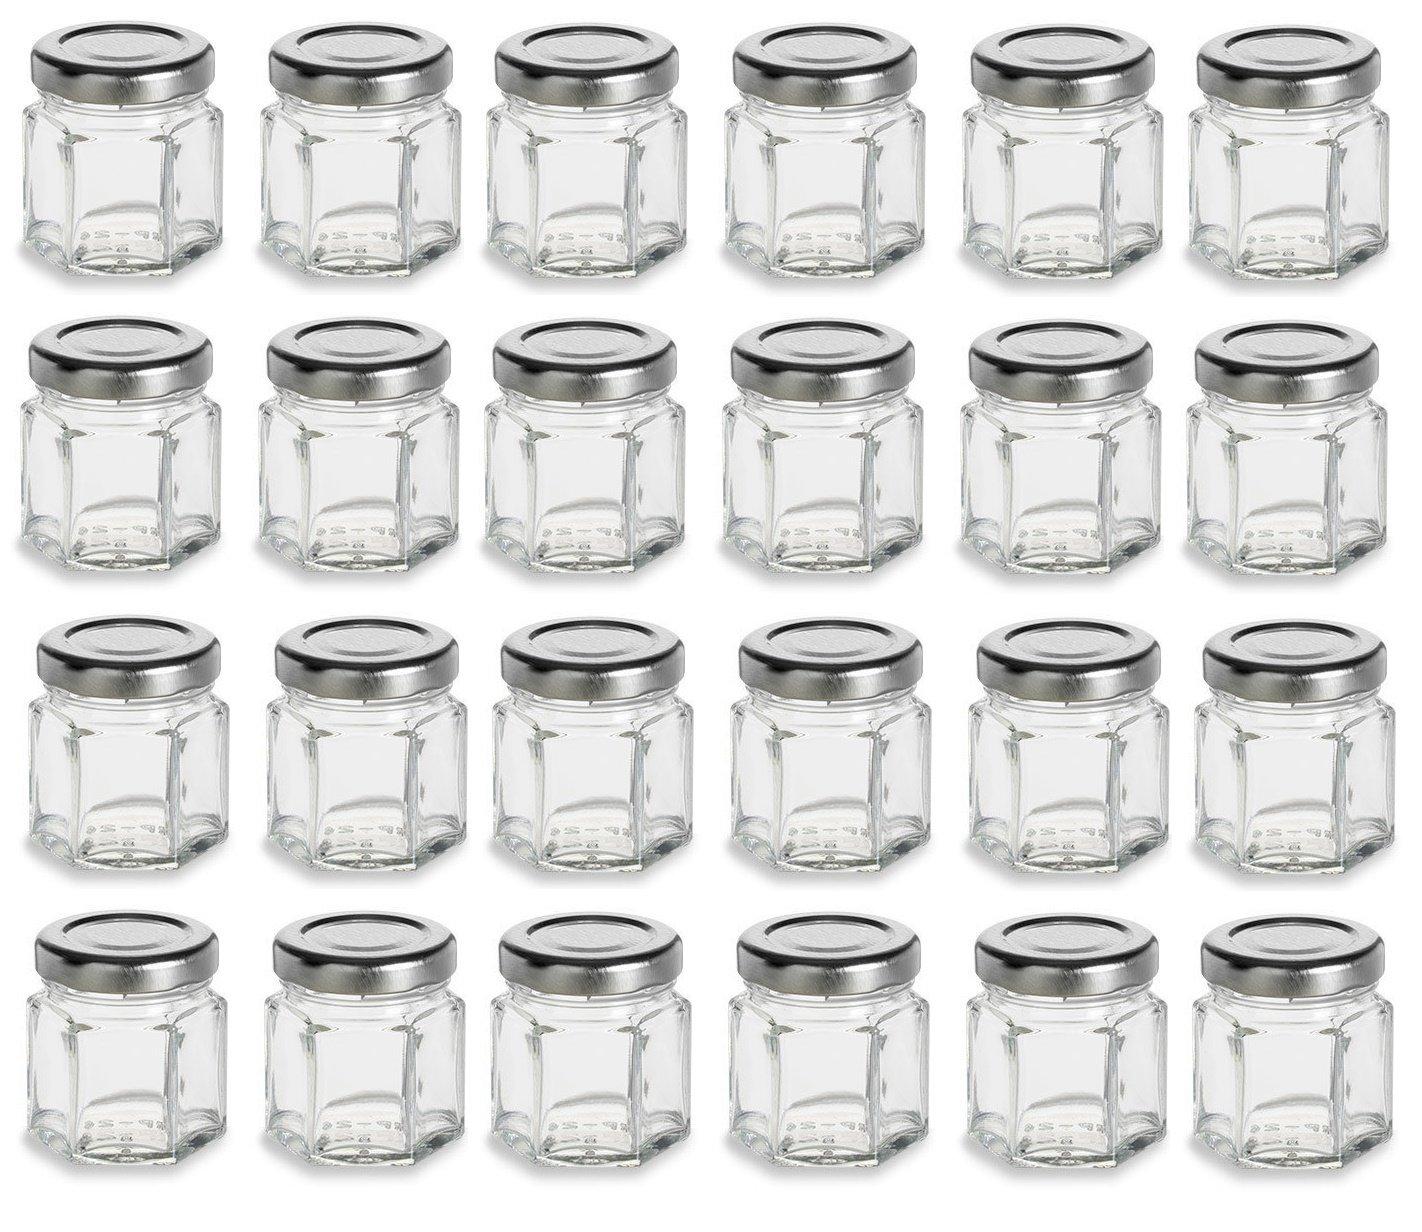 Nakpunar 24 pcs 1.5 oz Mini Hexagon Glass Jars with Silver Plastisol Lined Lids